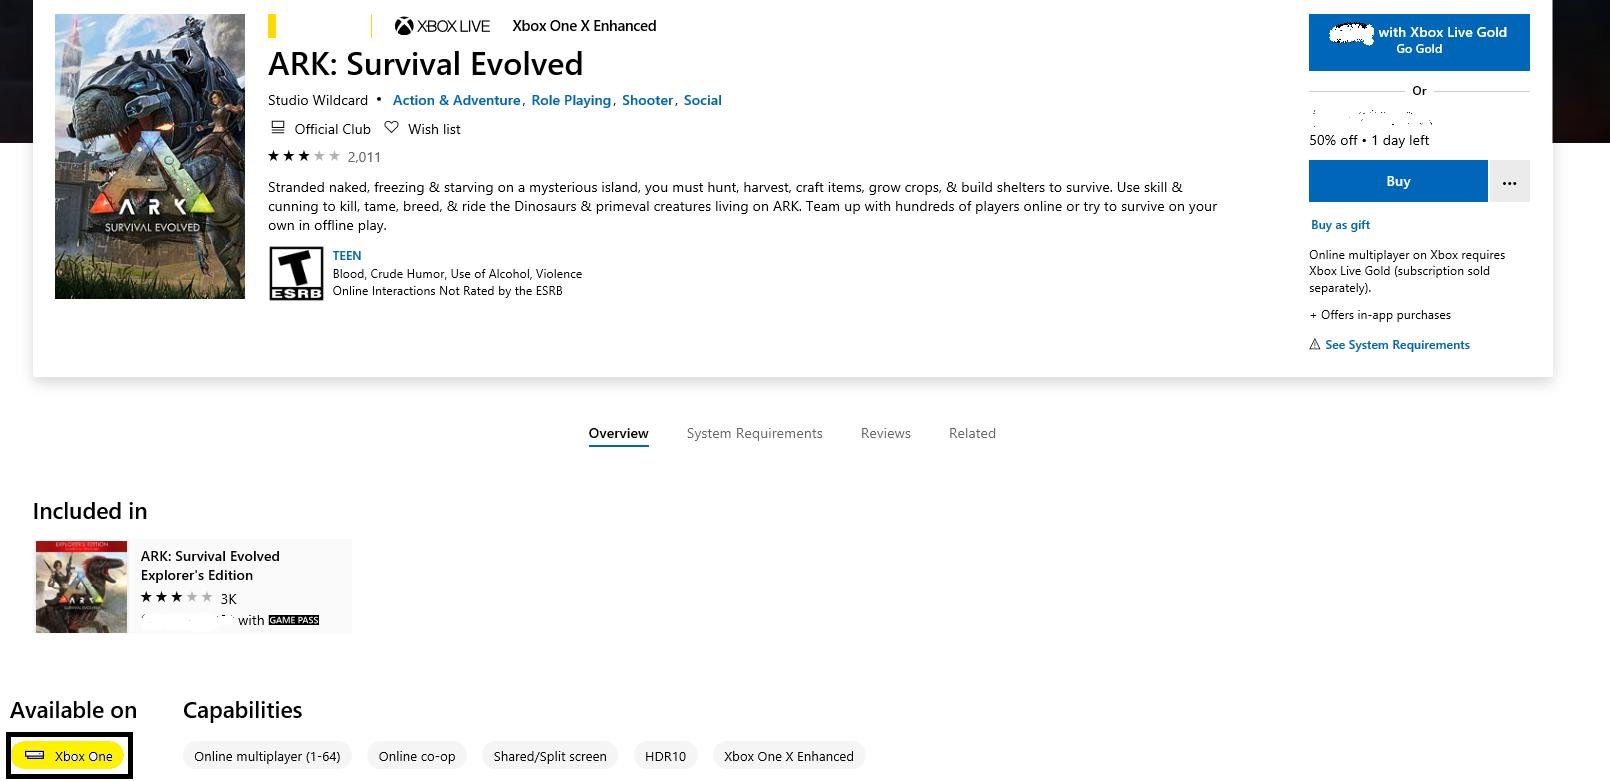 Ark Survival Evolved PC Windows 10 Splitscreen not working? 3f3e8035-d45a-4794-8581-6ba2c23f8874?upload=true.png